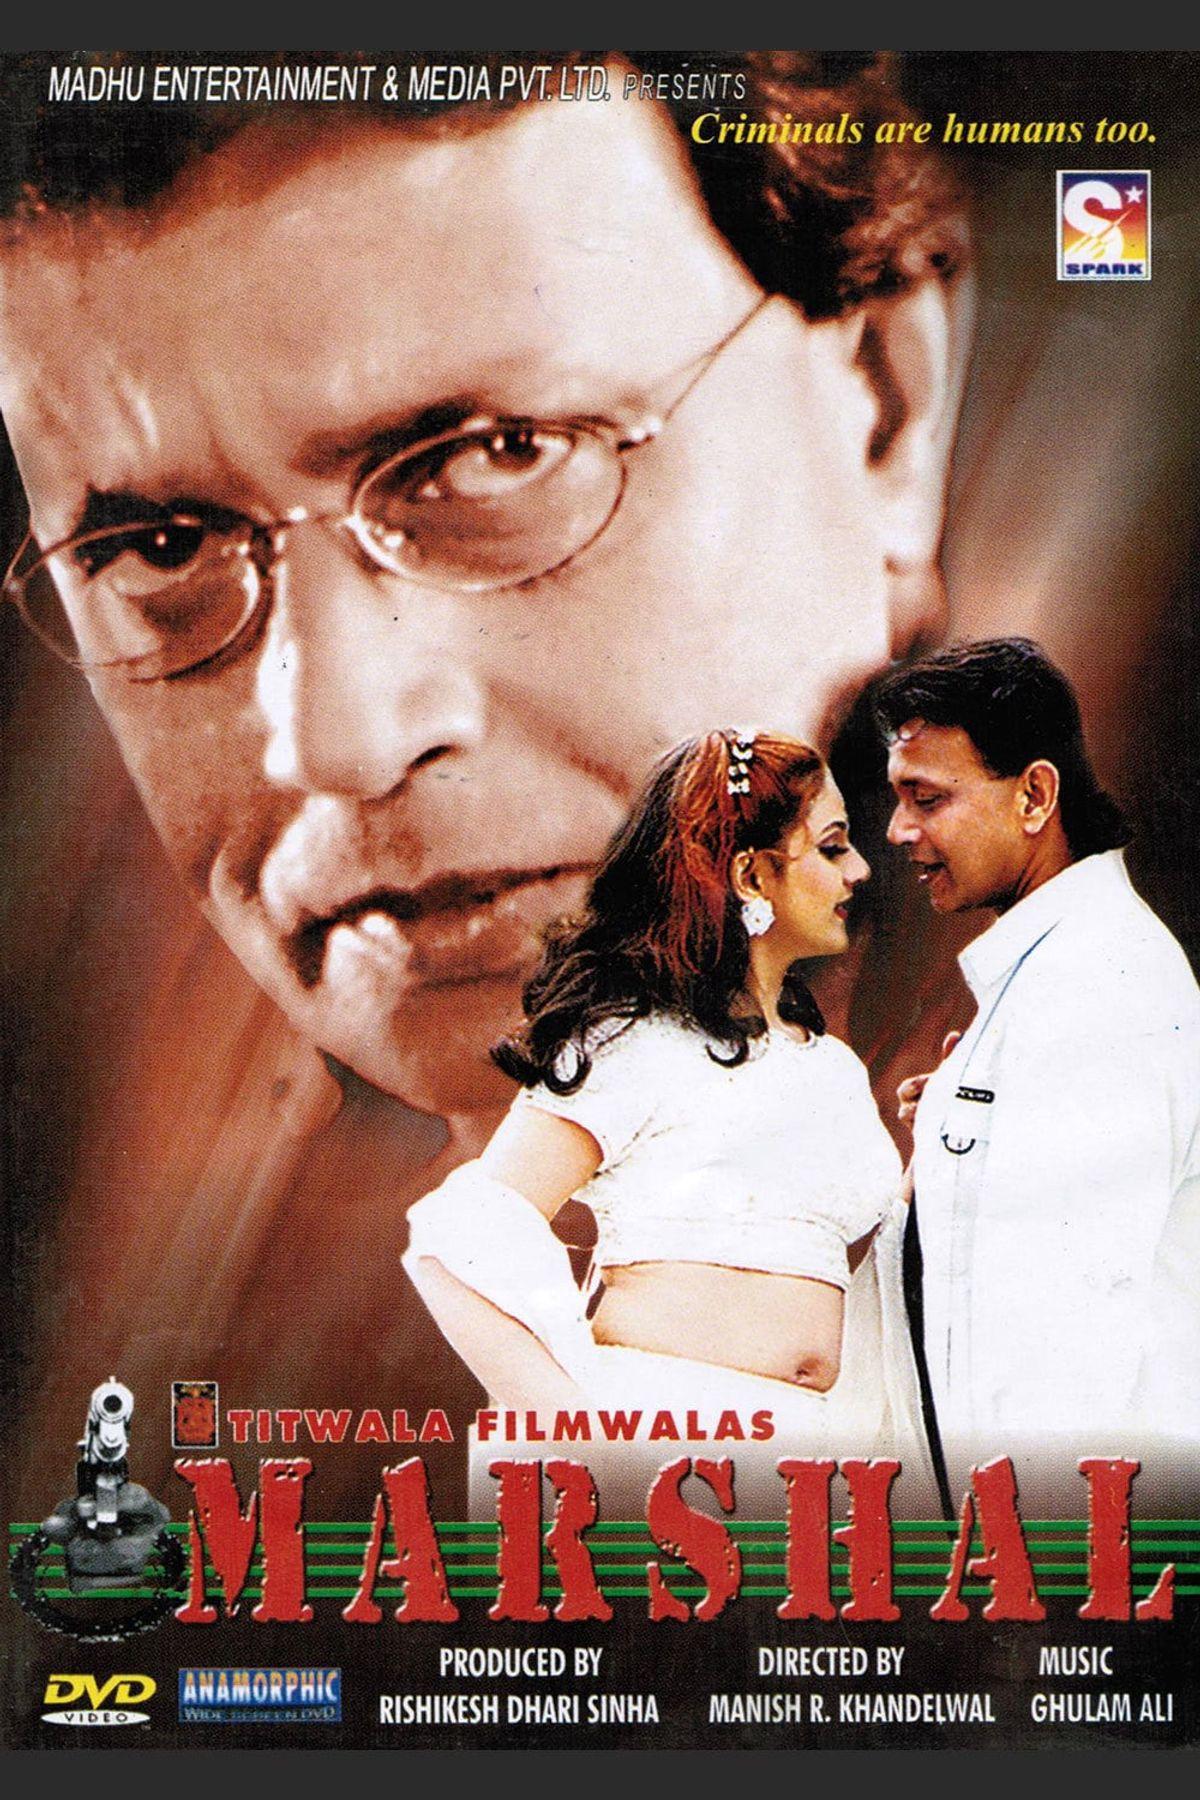 Brij Gopal Best Movies, TV Shows and Web Series List